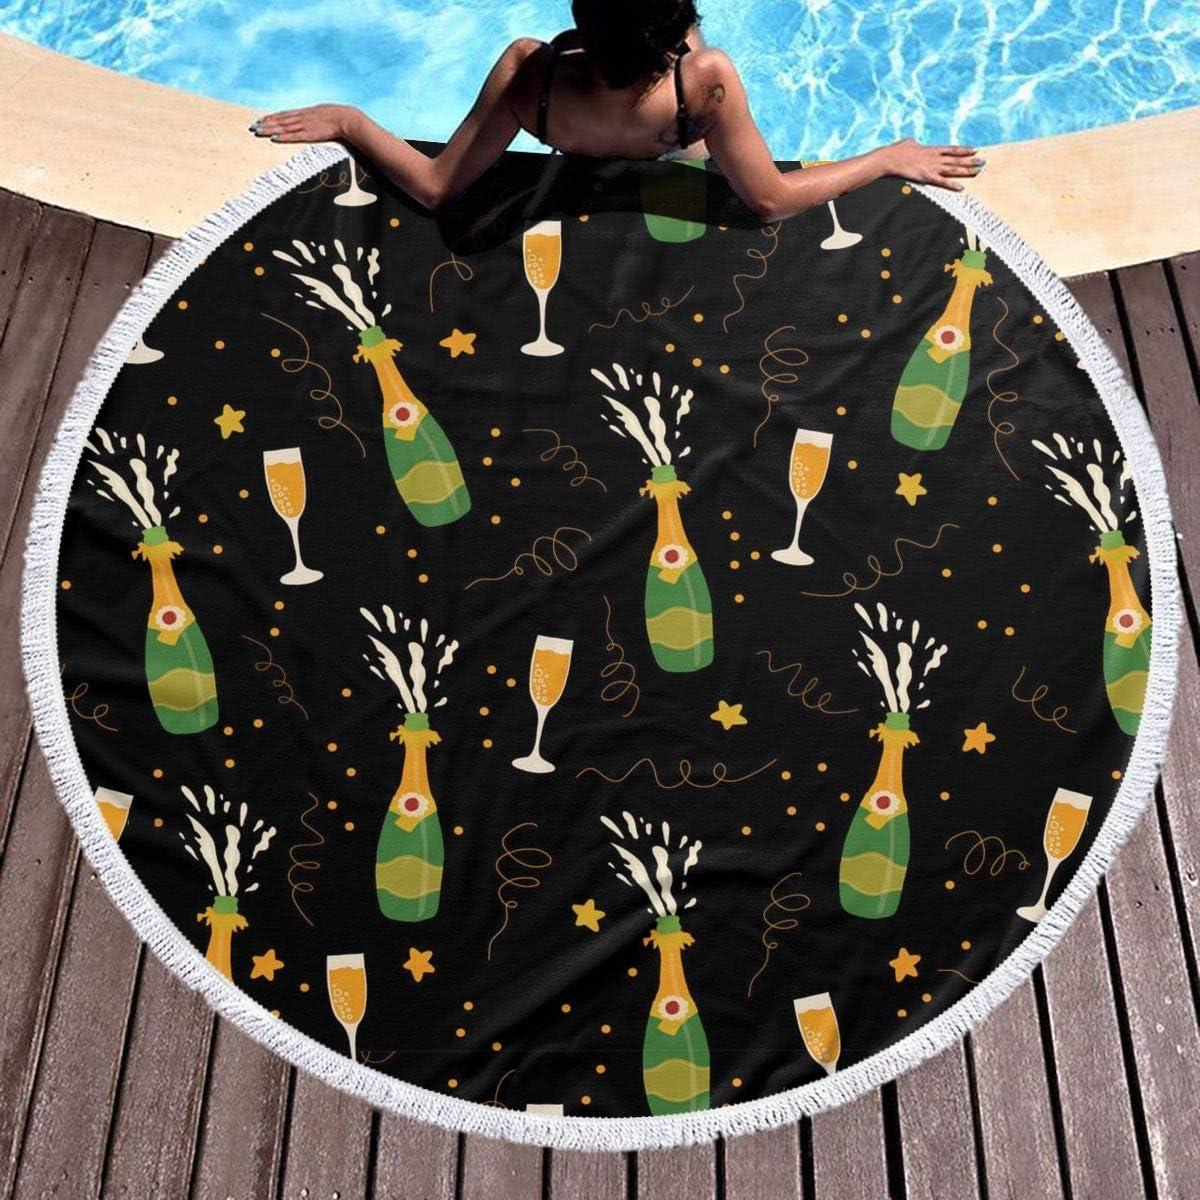 Round Towel Fruit Pattern Carpet Pool BeachBlanket Mat for Kids /& Adults